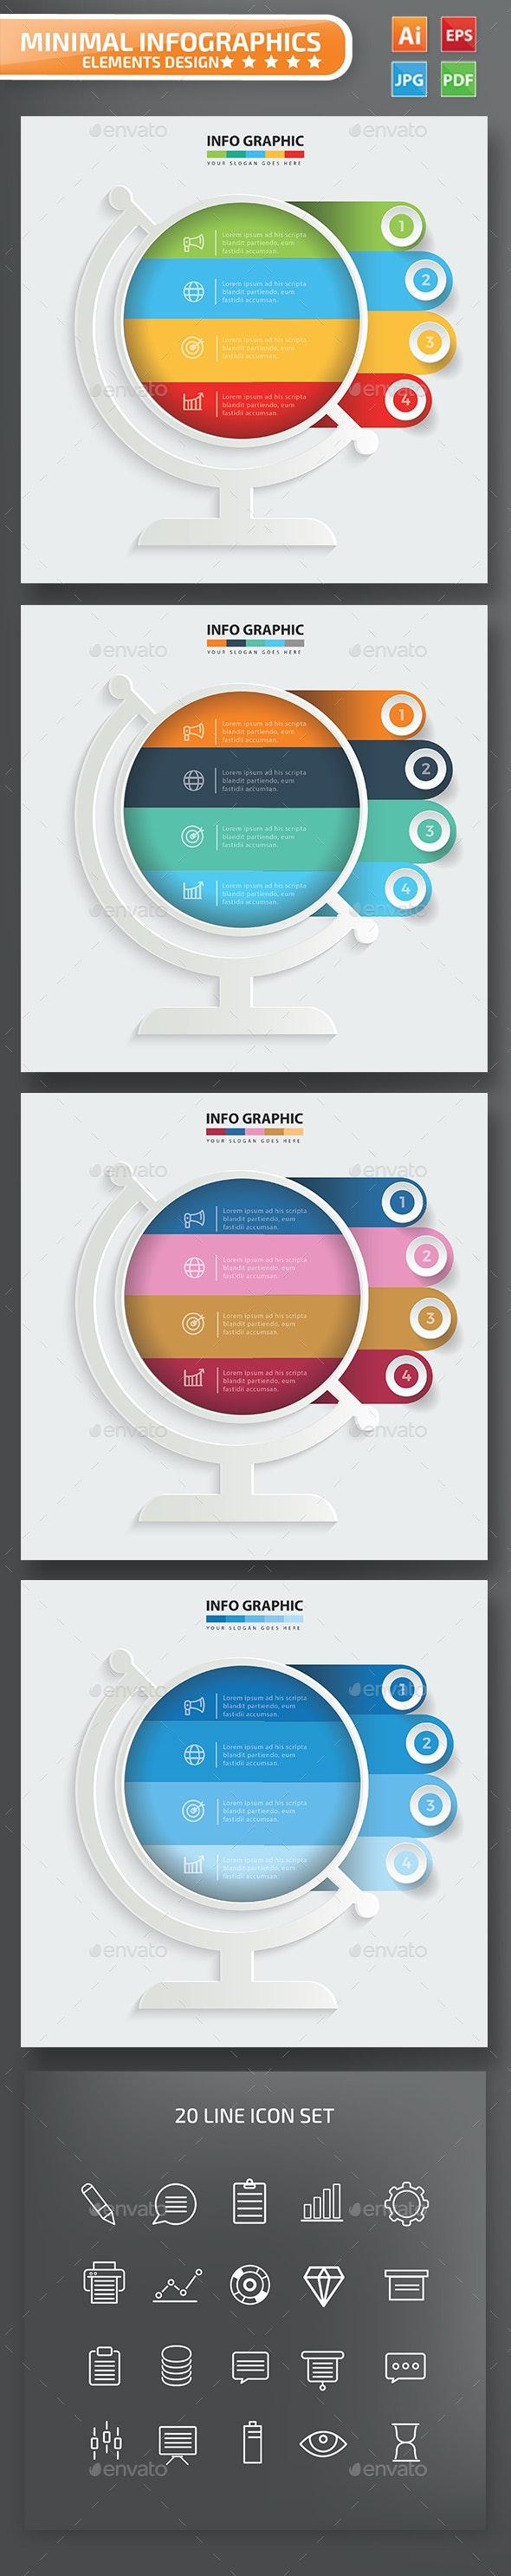 Global Infographic Design - Infographics